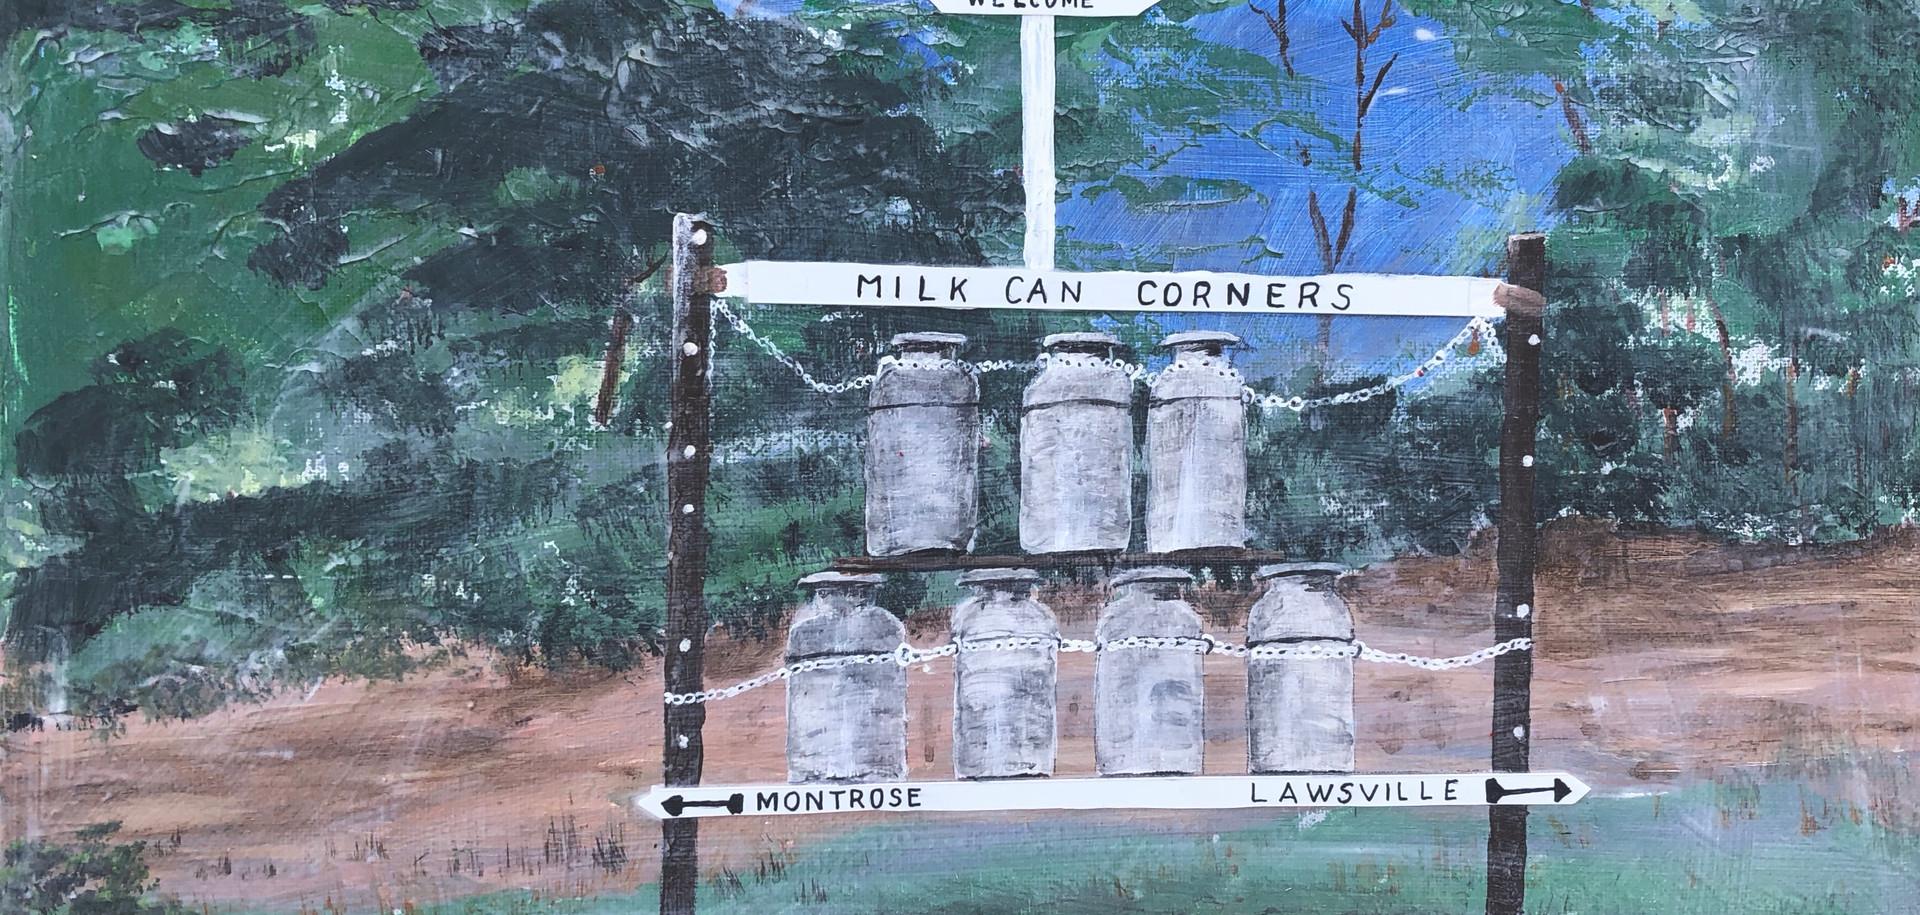 825 - Milk Can Corners .jpeg